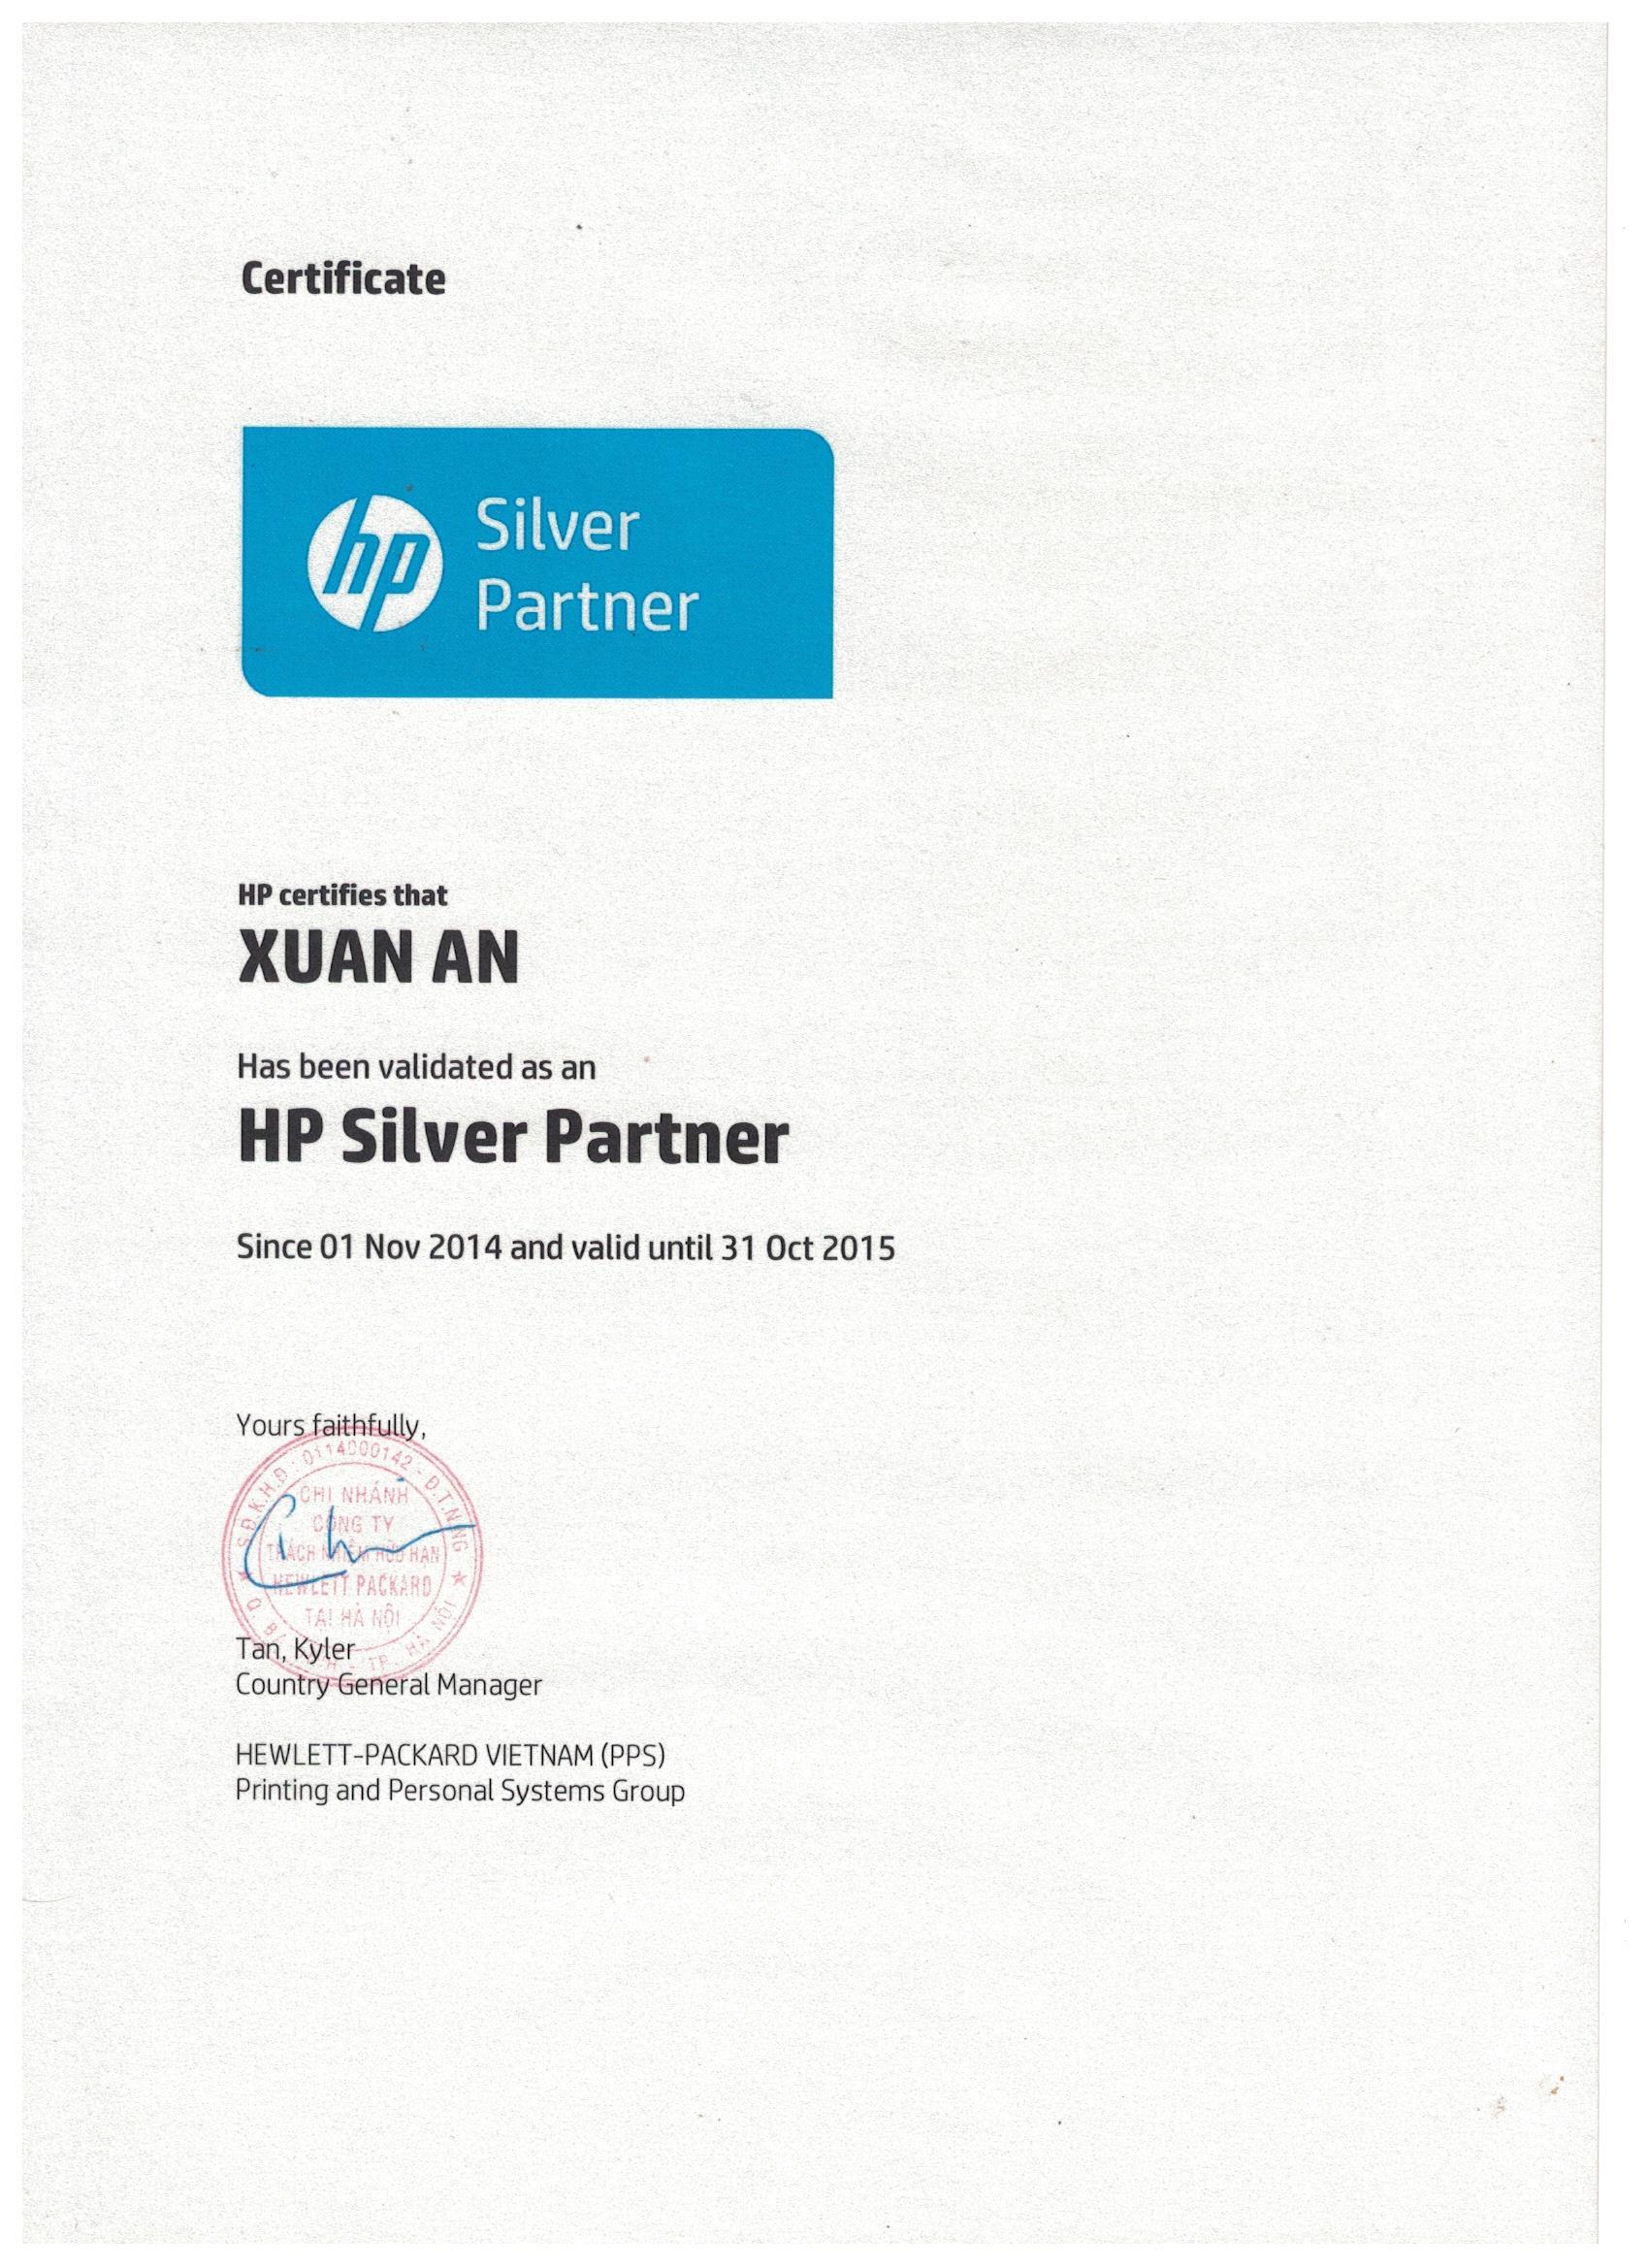 HP Probook 450 G4 - Z6T19PA (Silver)